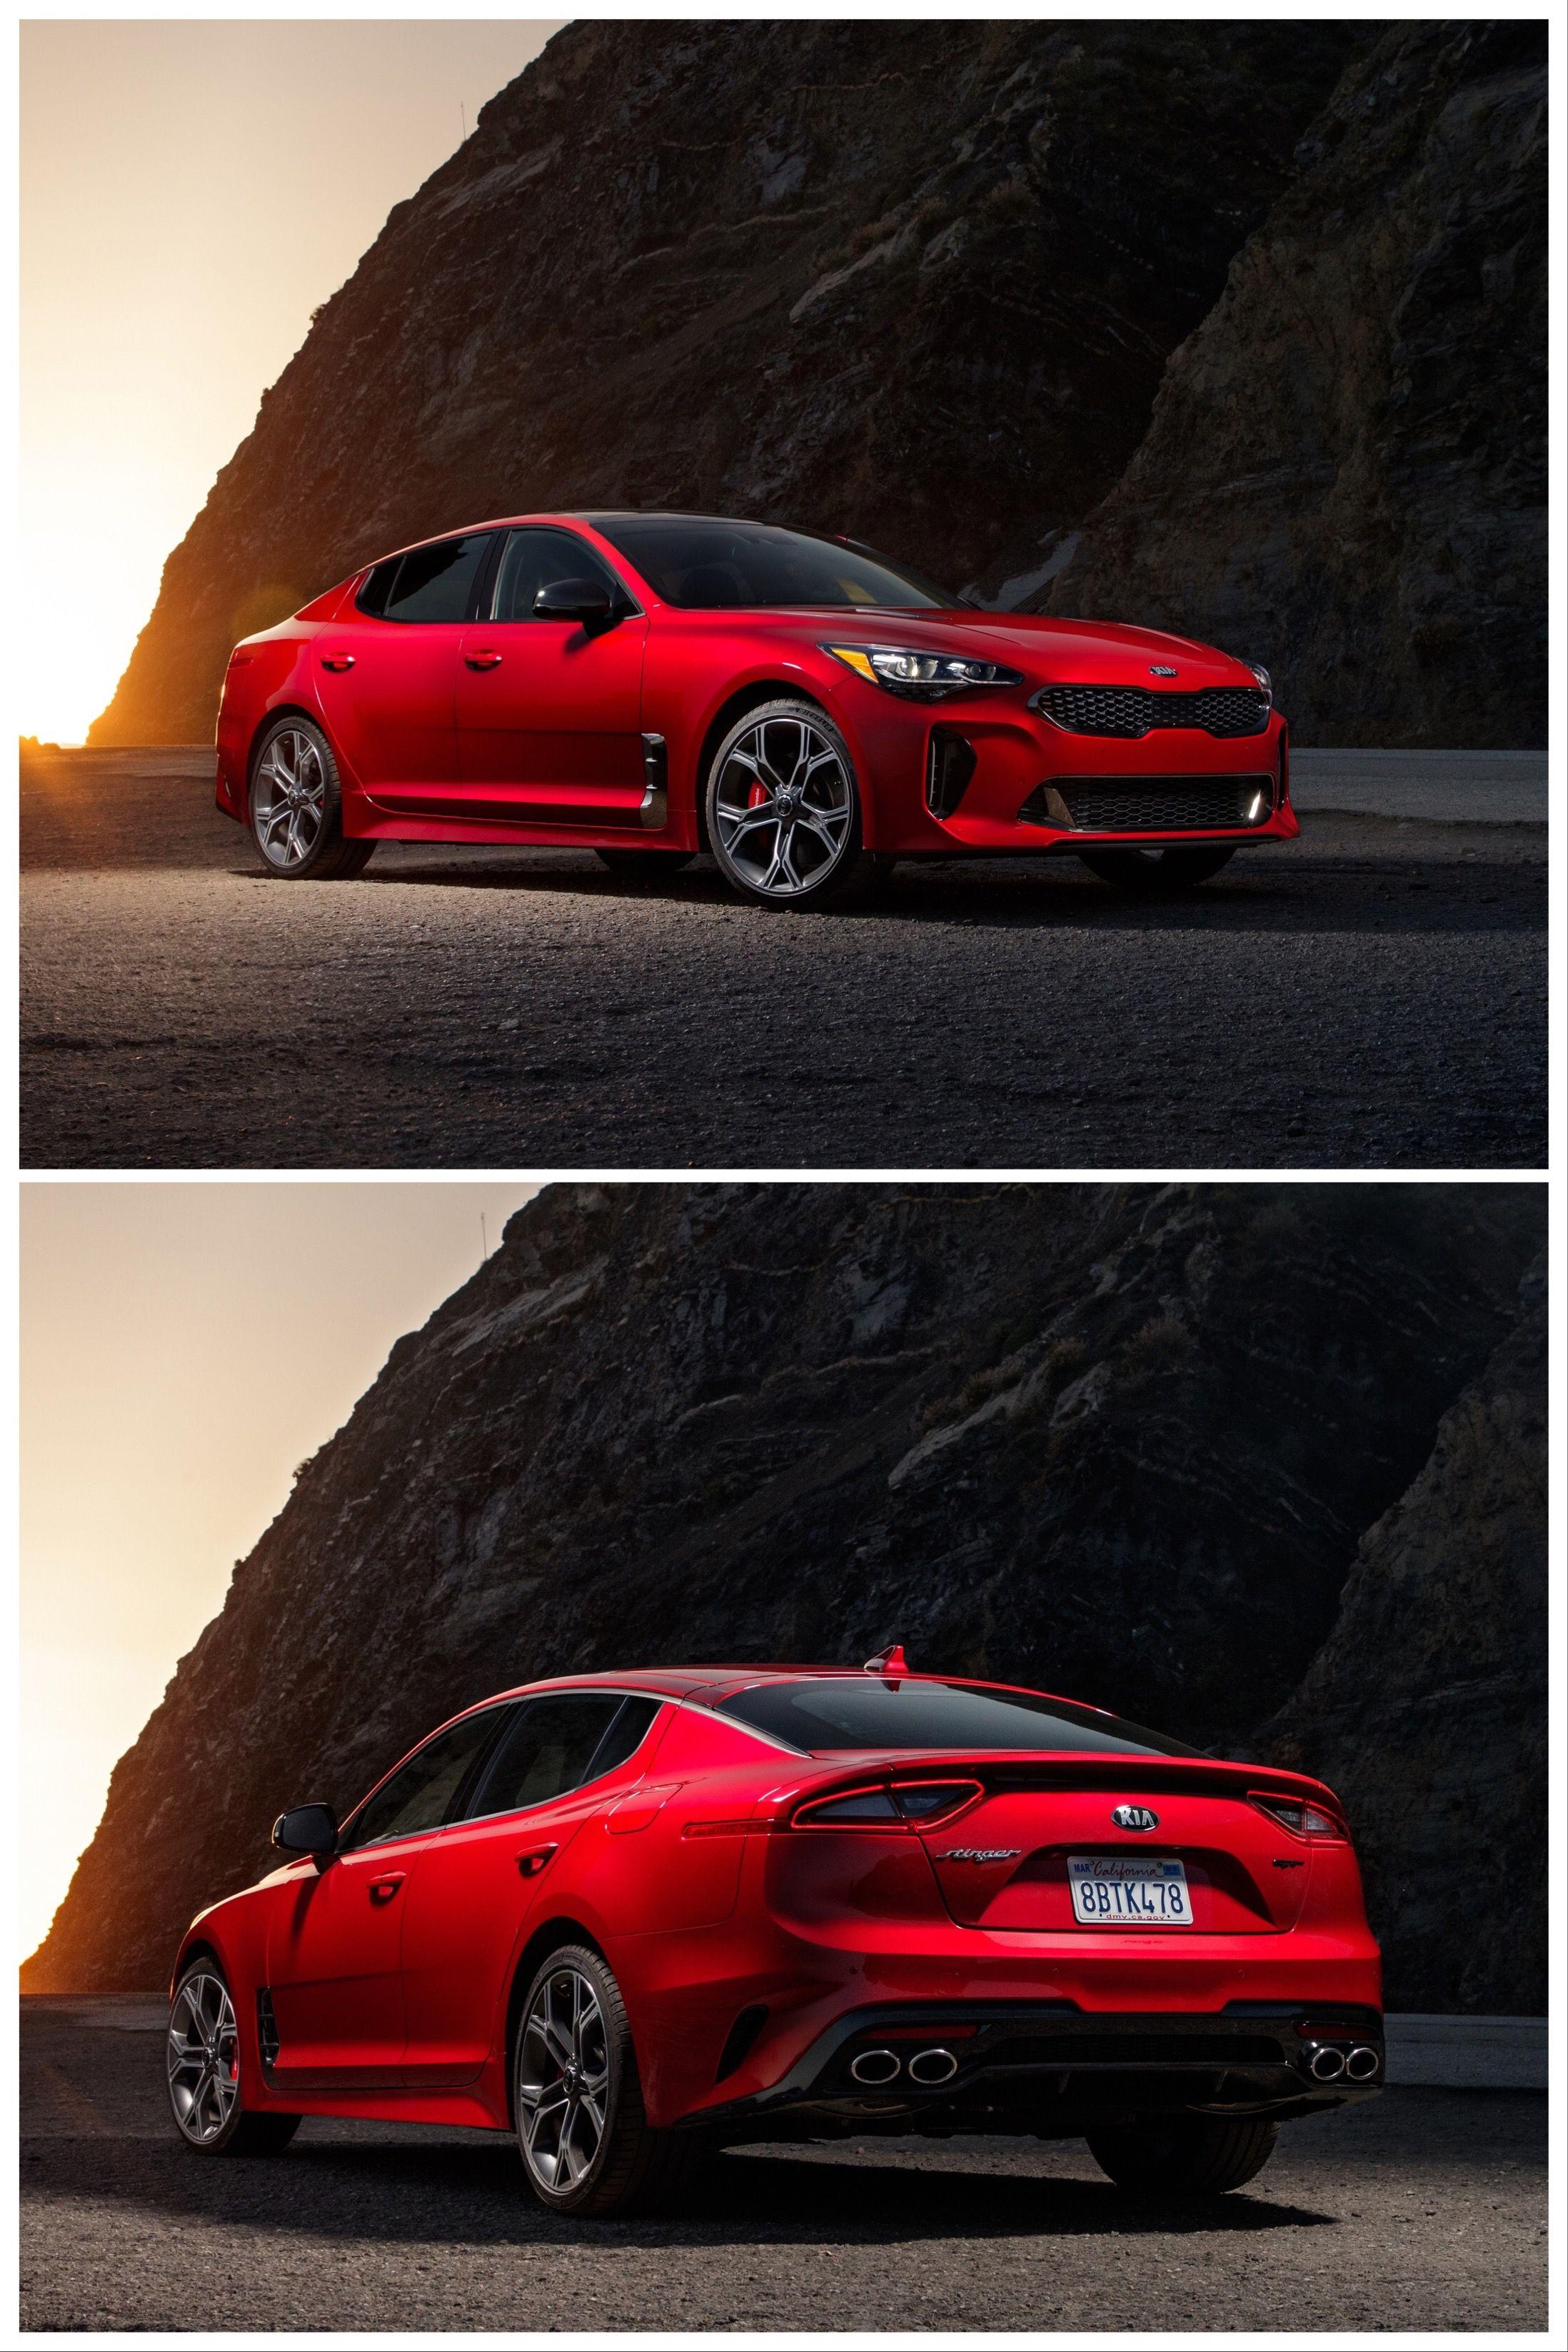 Kia Stinger Gt Long Term Test Wrap Balance Is Key In 2020 Kia Stinger Kia Sports Sedan